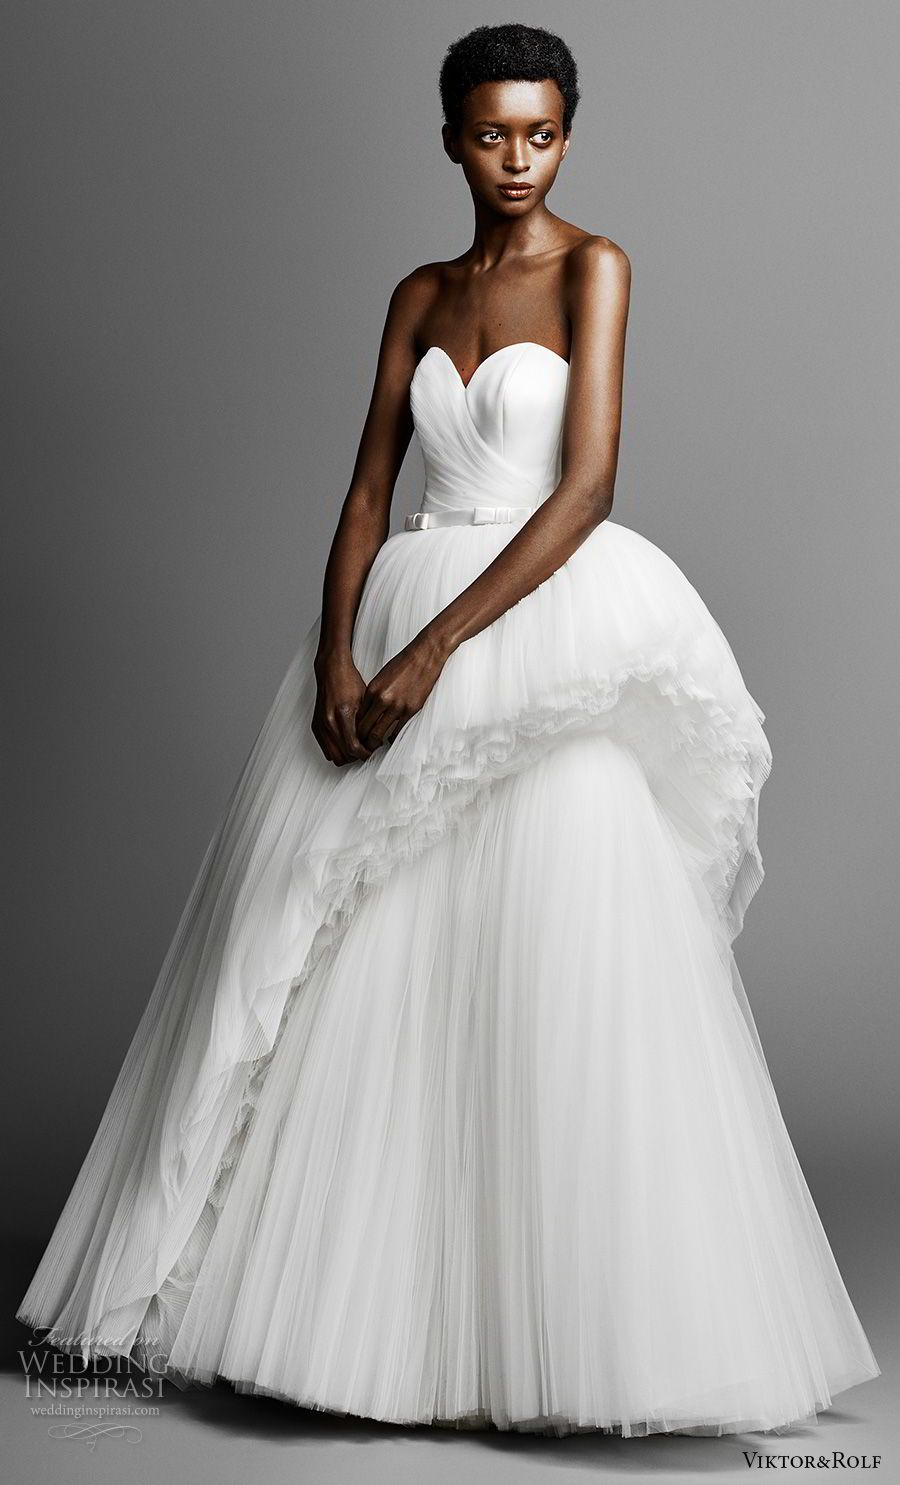 665c3be56a97 viktor and rolf spring 2019 bridal strapless sweetheart necklinr wrap over  bodice romantic ball gown a line wedding dress (3) mv -- Viktor Rolf Spring  2019 ...